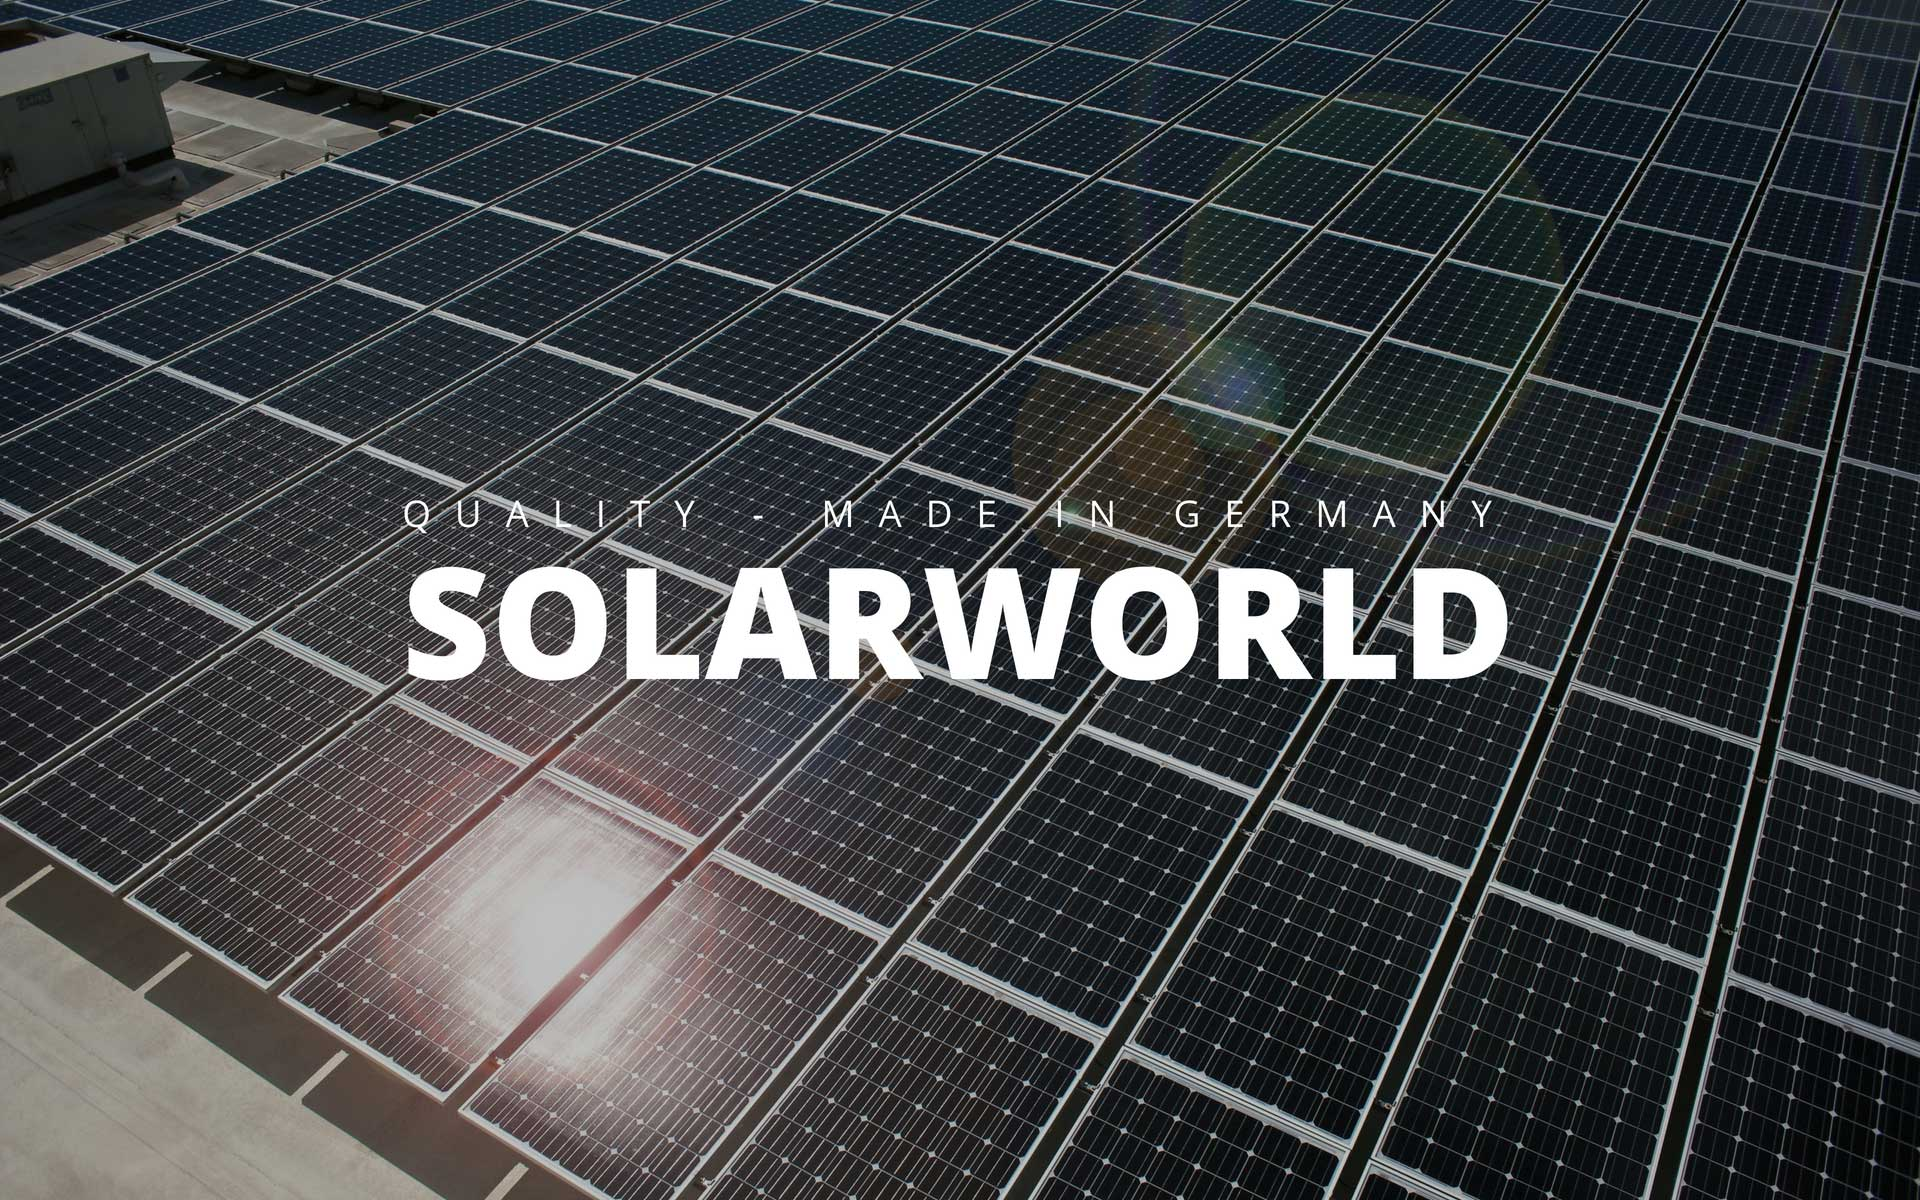 SOLARWORLD - Made in Germany